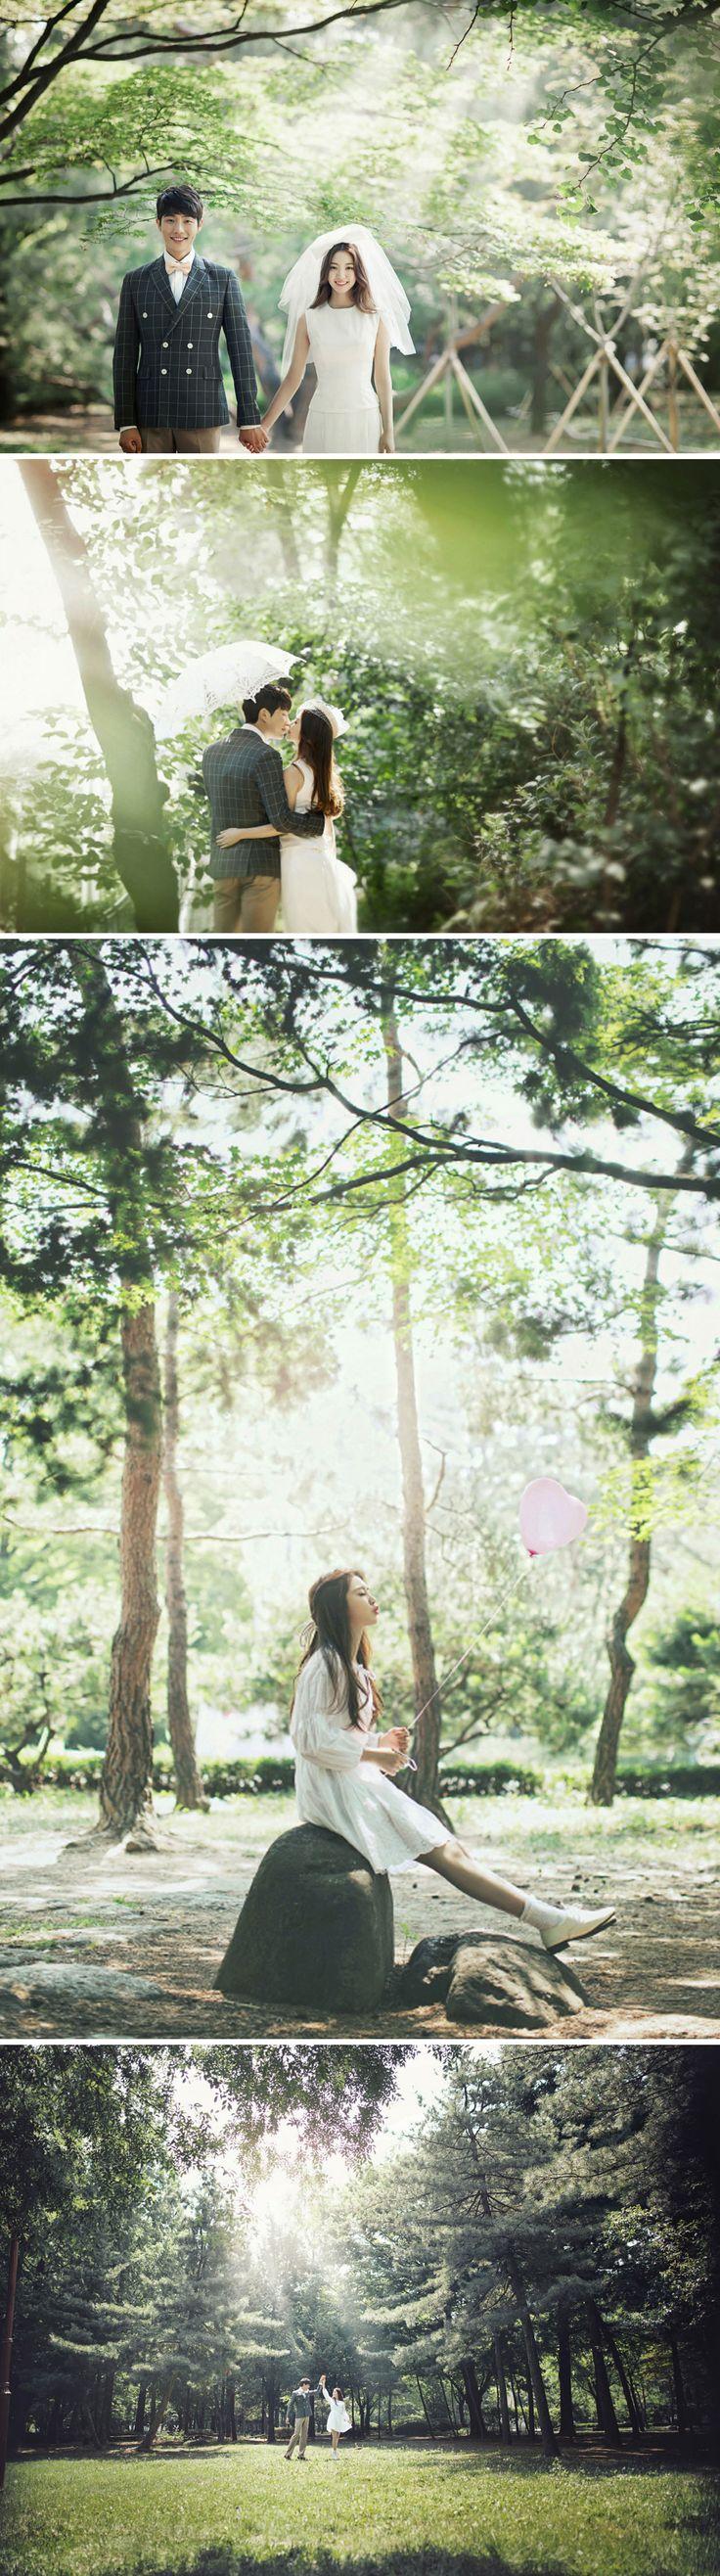 Korea outdoor pre-wedding photoshoot! Love the lush greenery!                                                                                                                                                                                 More